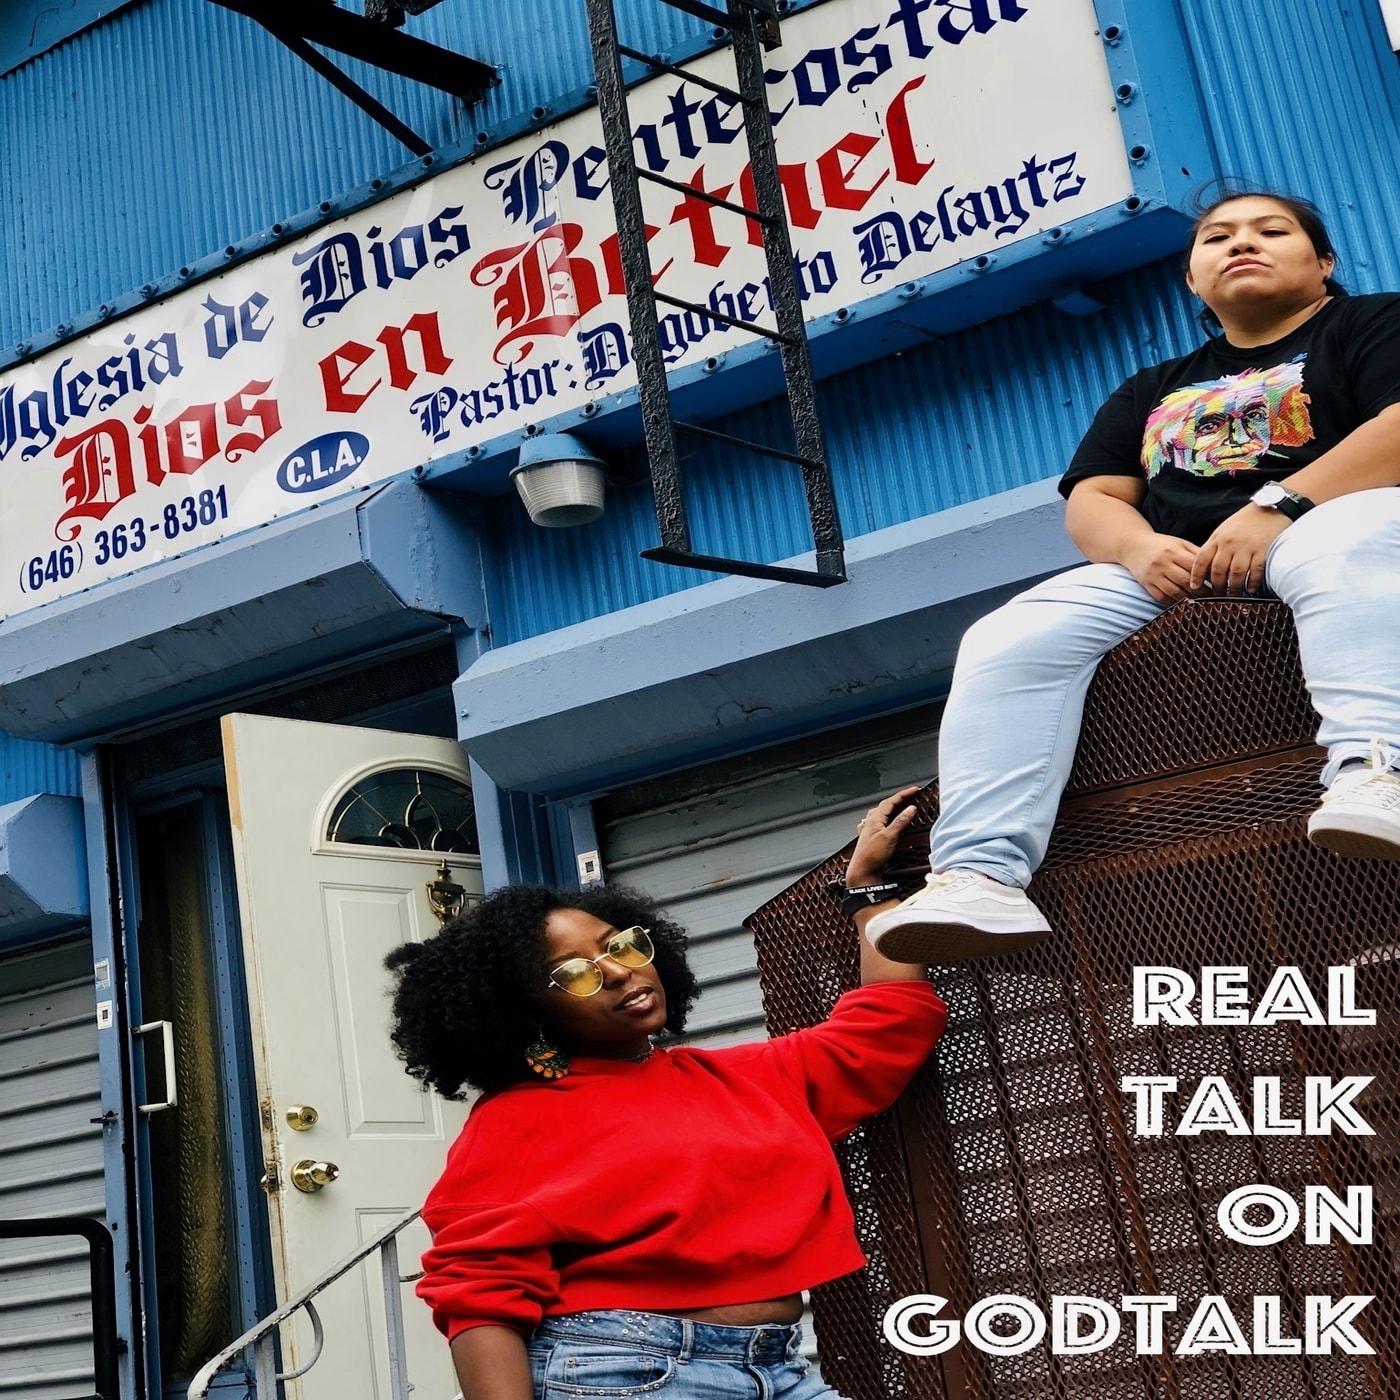 Real Talk On Godtalk Season 2 Bonus Episode show art